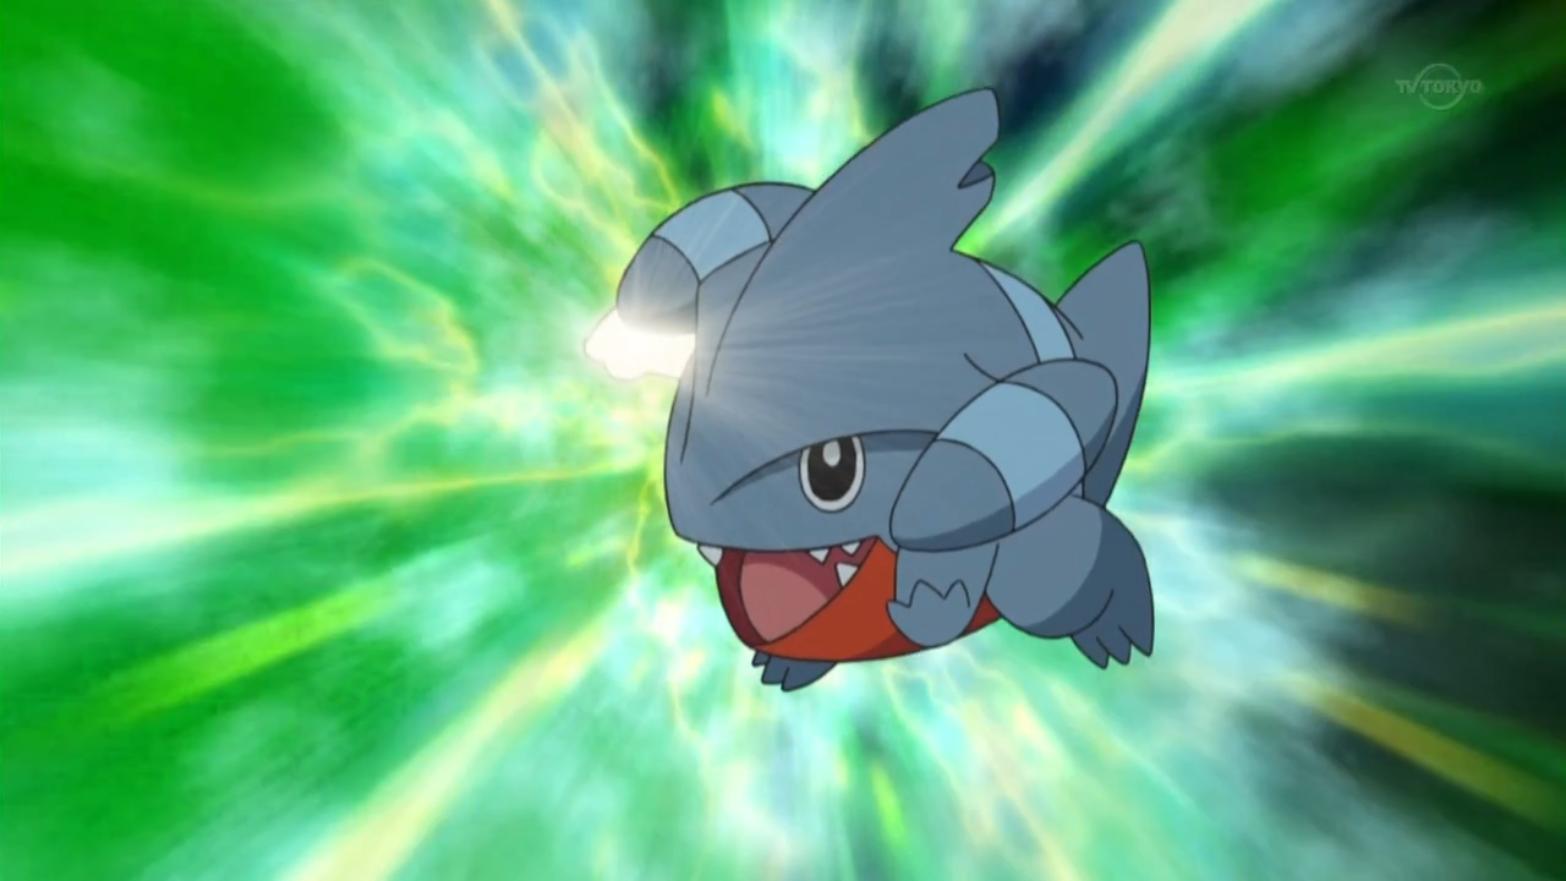 Ho to get rock smash in Pokemon crystal - Super Cheats